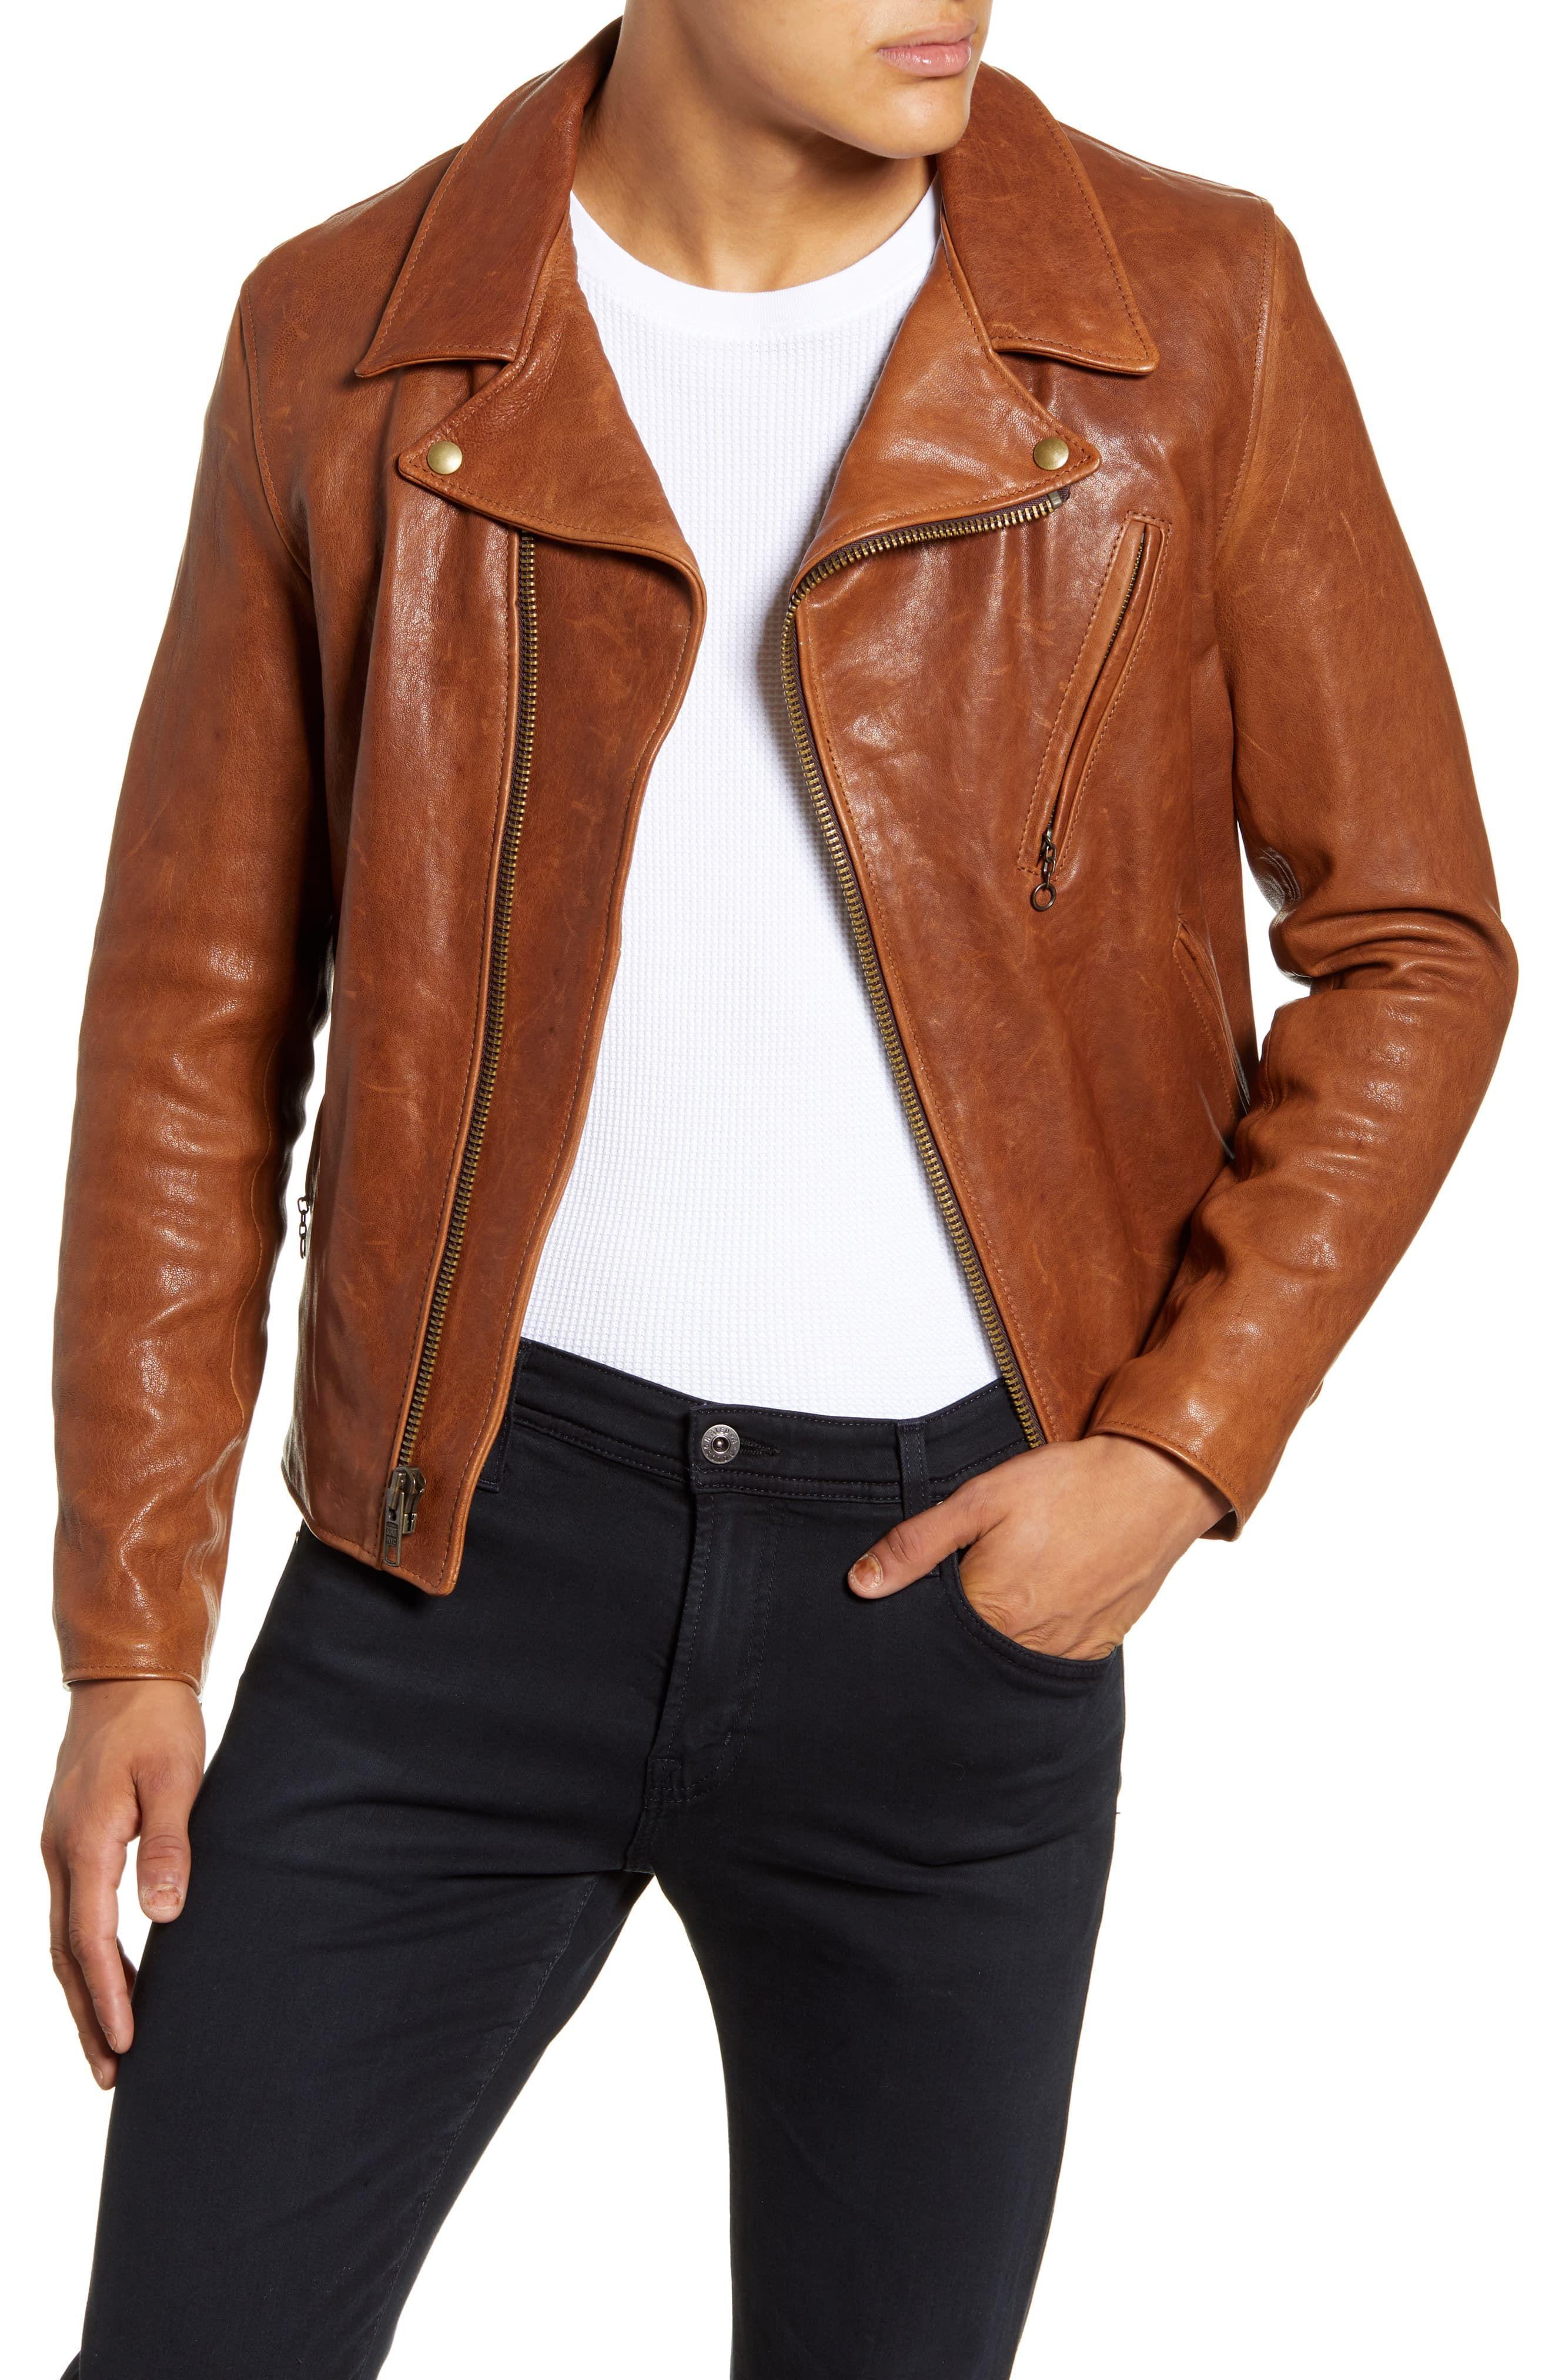 Schott Nyc Leather Moto Jacket Nordstrom In 2021 Leather Jacket Outfit Men Leather Jacket Men Leather Jacket Style [ 4048 x 2640 Pixel ]